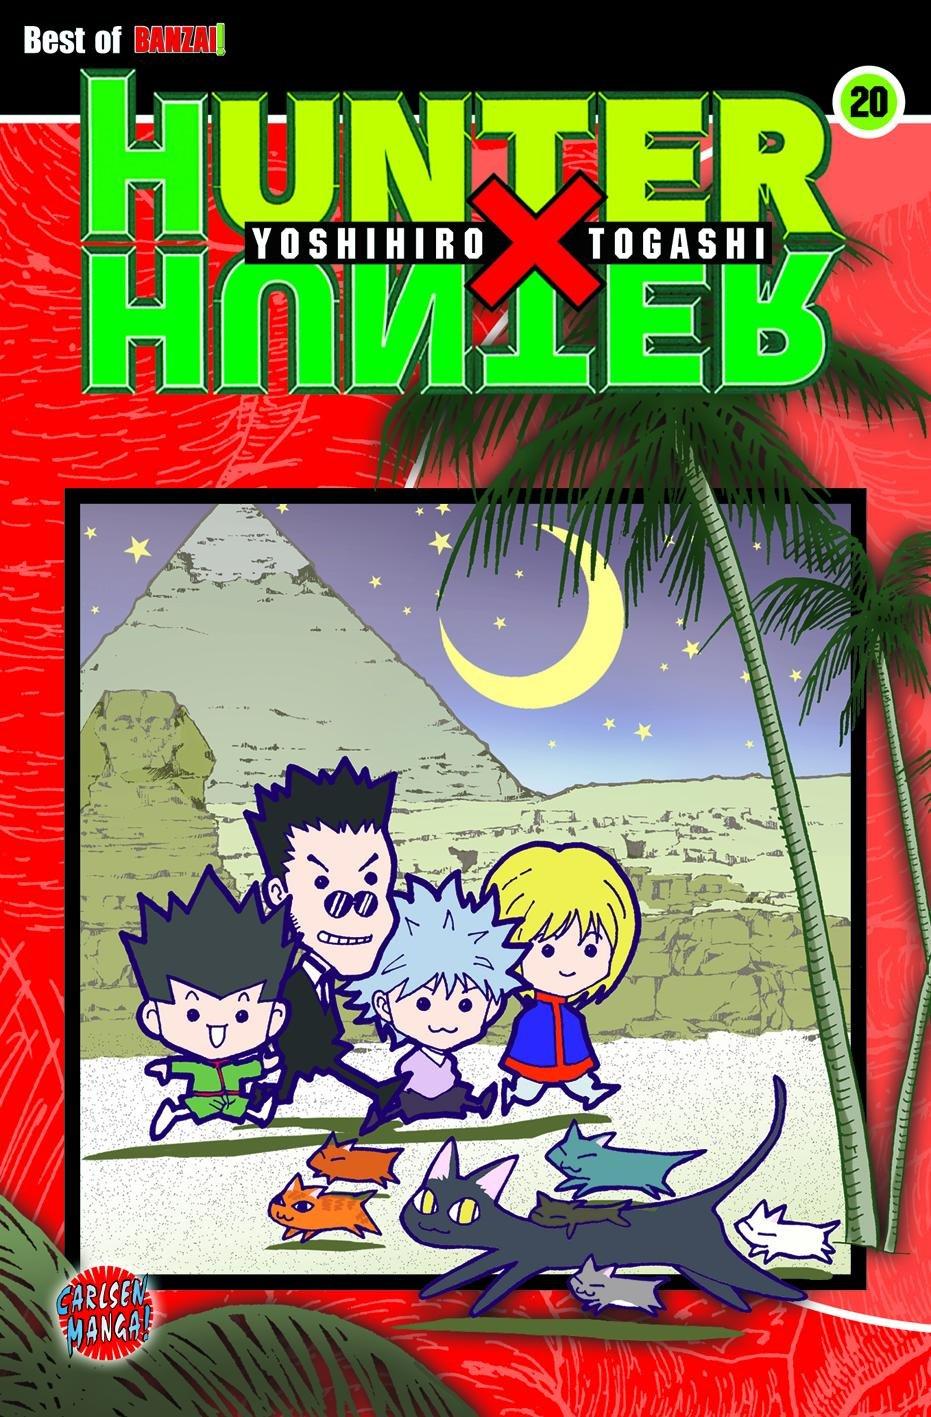 Hunter X Hunter, Band 20 Taschenbuch – 22. August 2008 Yoshihiro Togashi Hiro Yamada Carlsen 3551762309